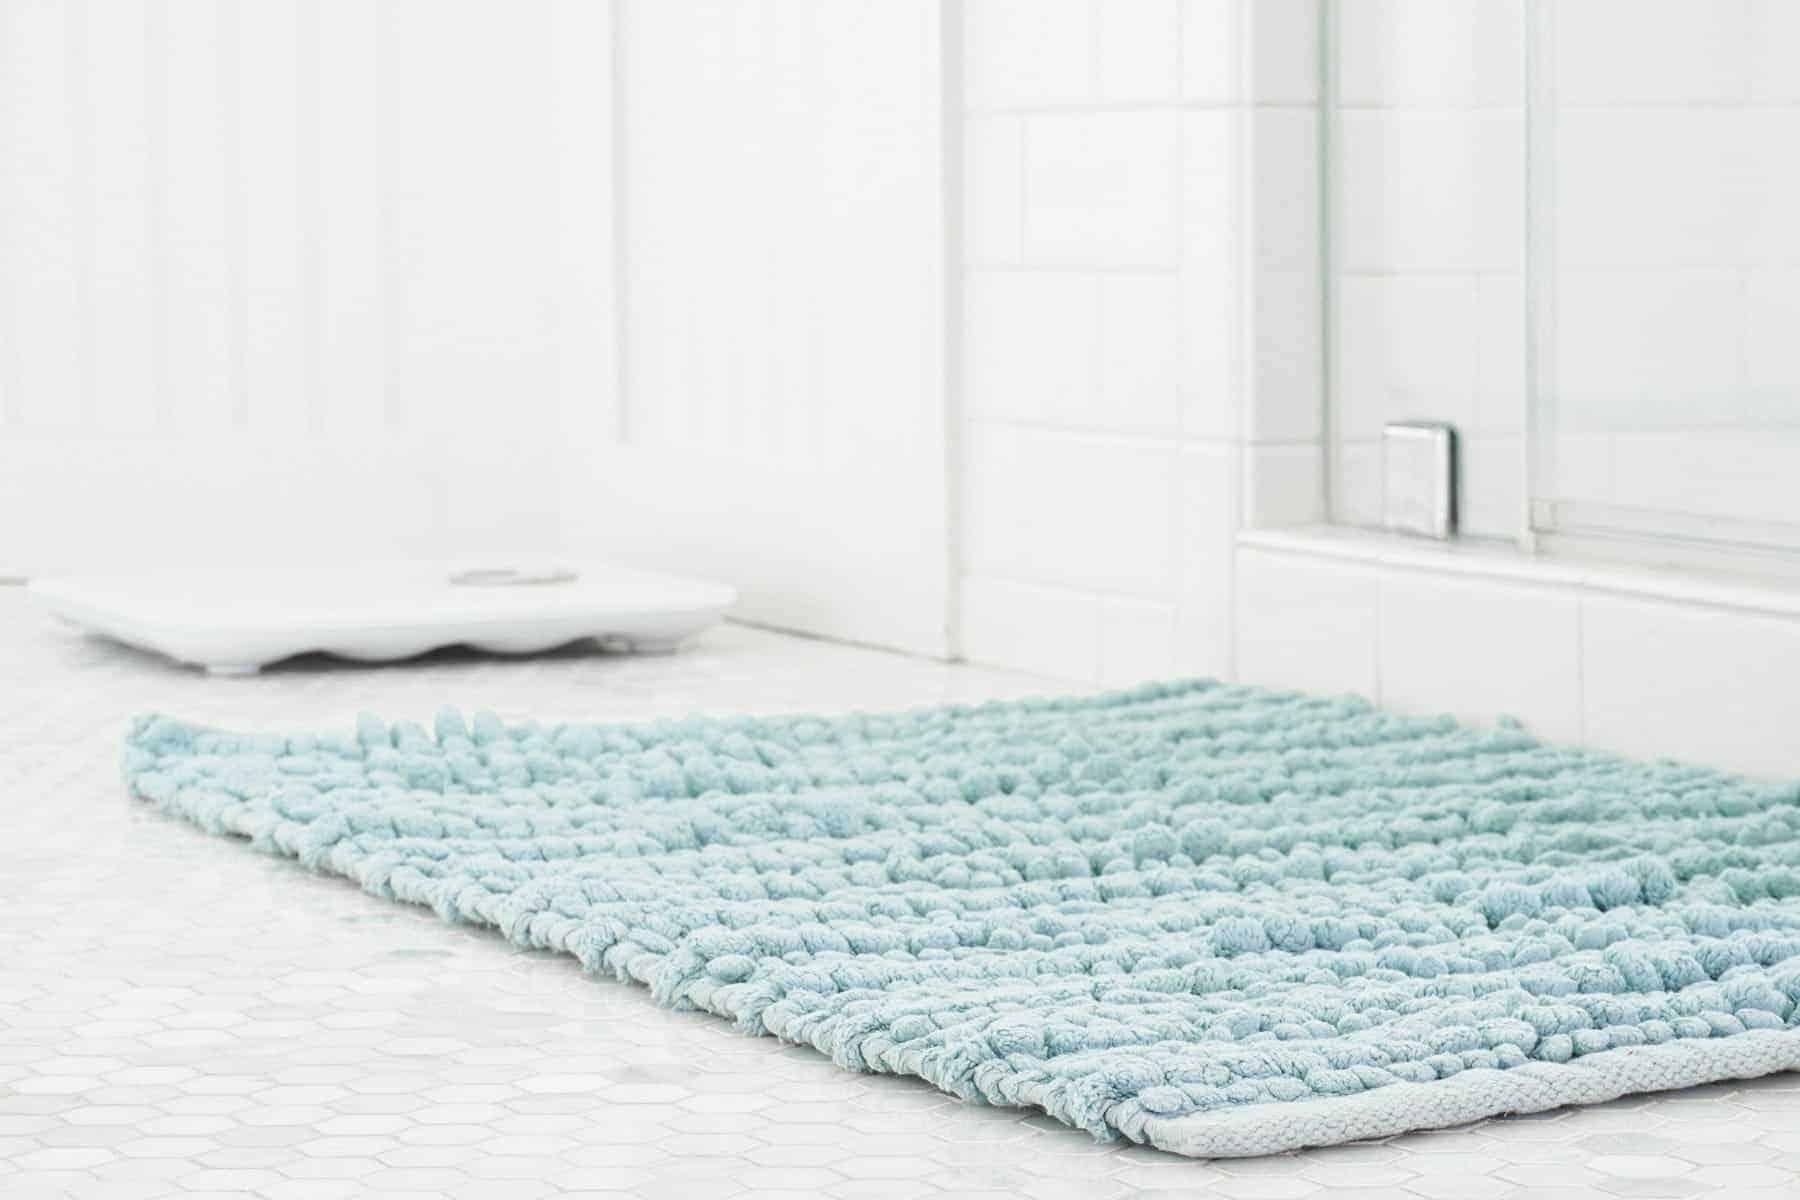 Clean bathroom mats